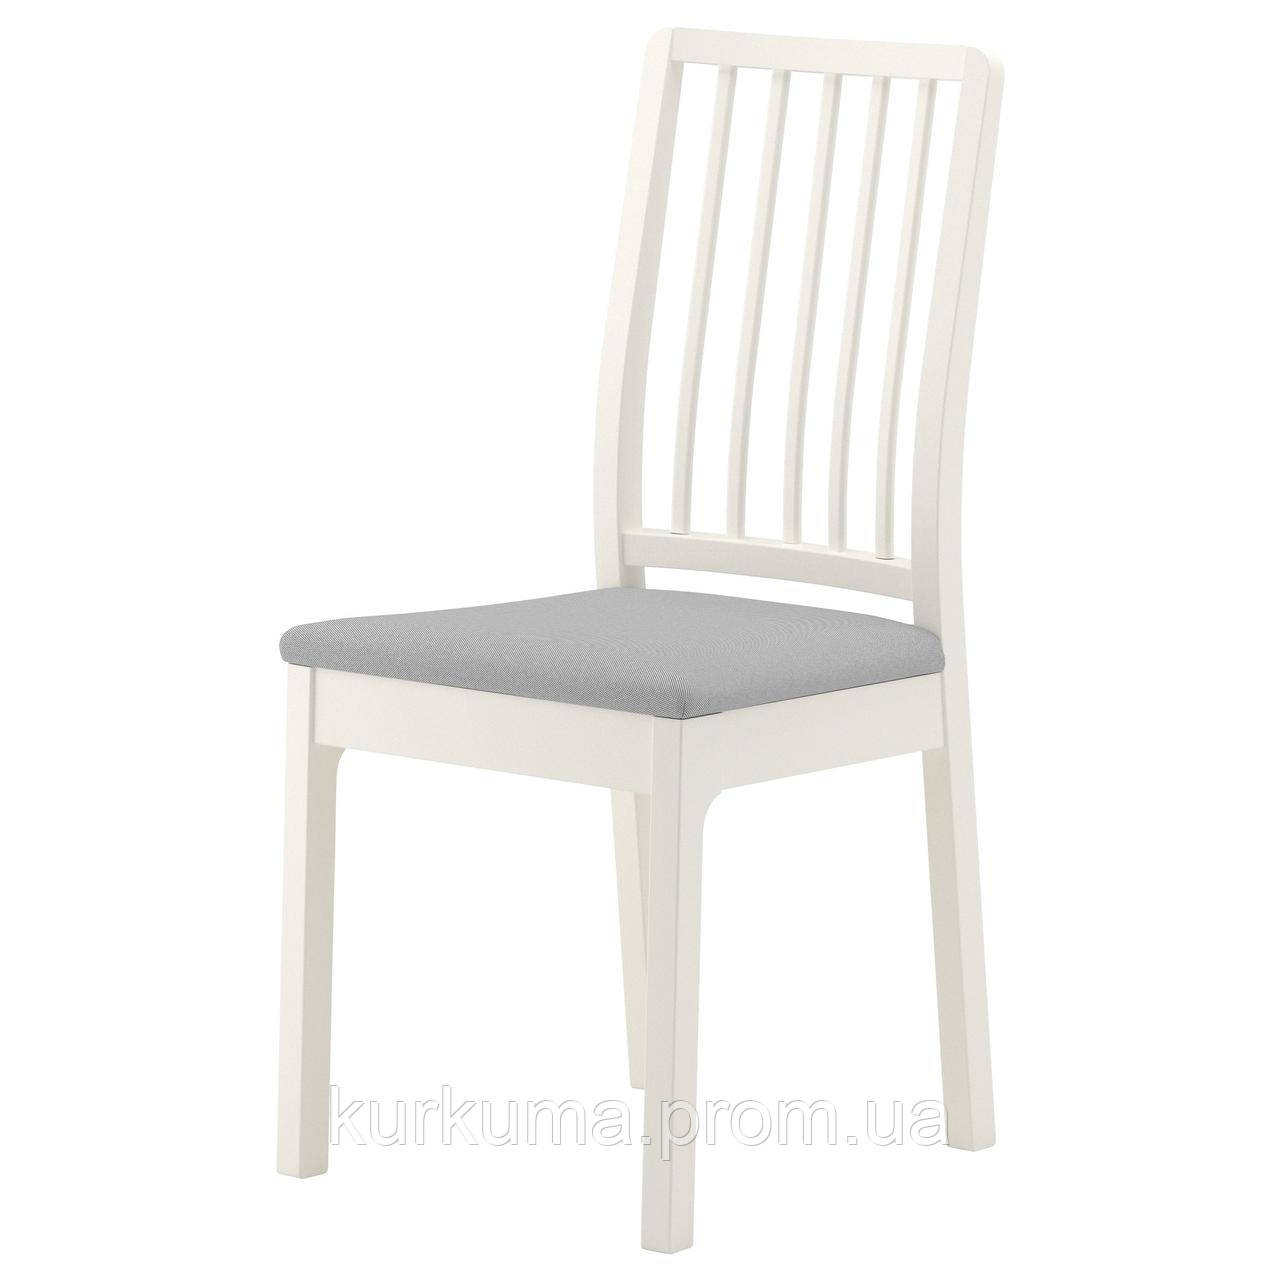 IKEA EKEDALEN Стул, белый, Оррста светло-серый  (603.410.15)